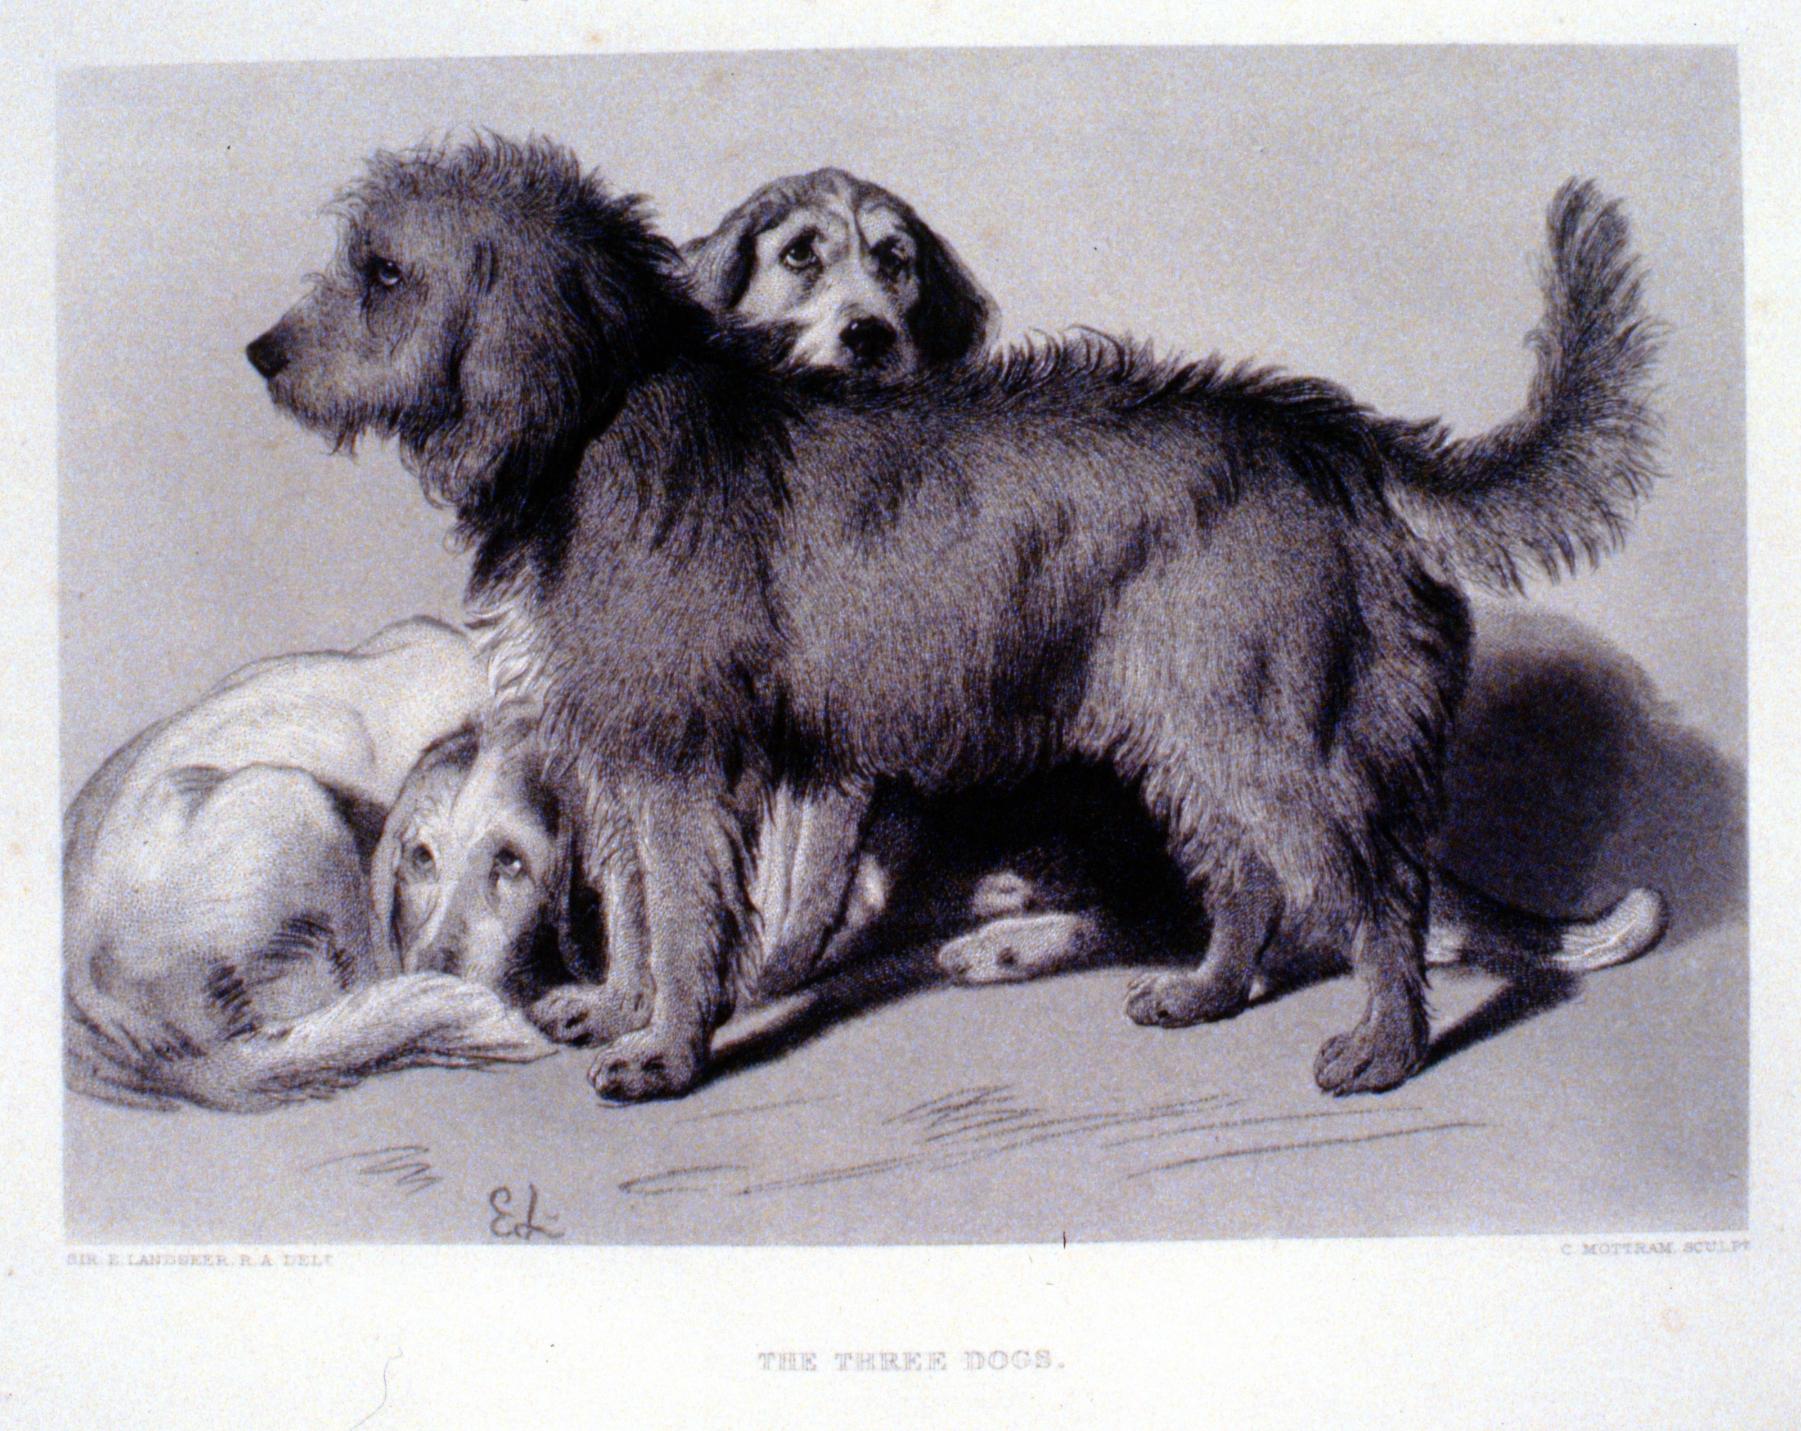 The Three Dogs , c. late 19th Century, Charles Mottram, steel engraving, 17.7 cm x 25.3 cm, 1996.08.05, gift of Yvonne Adams